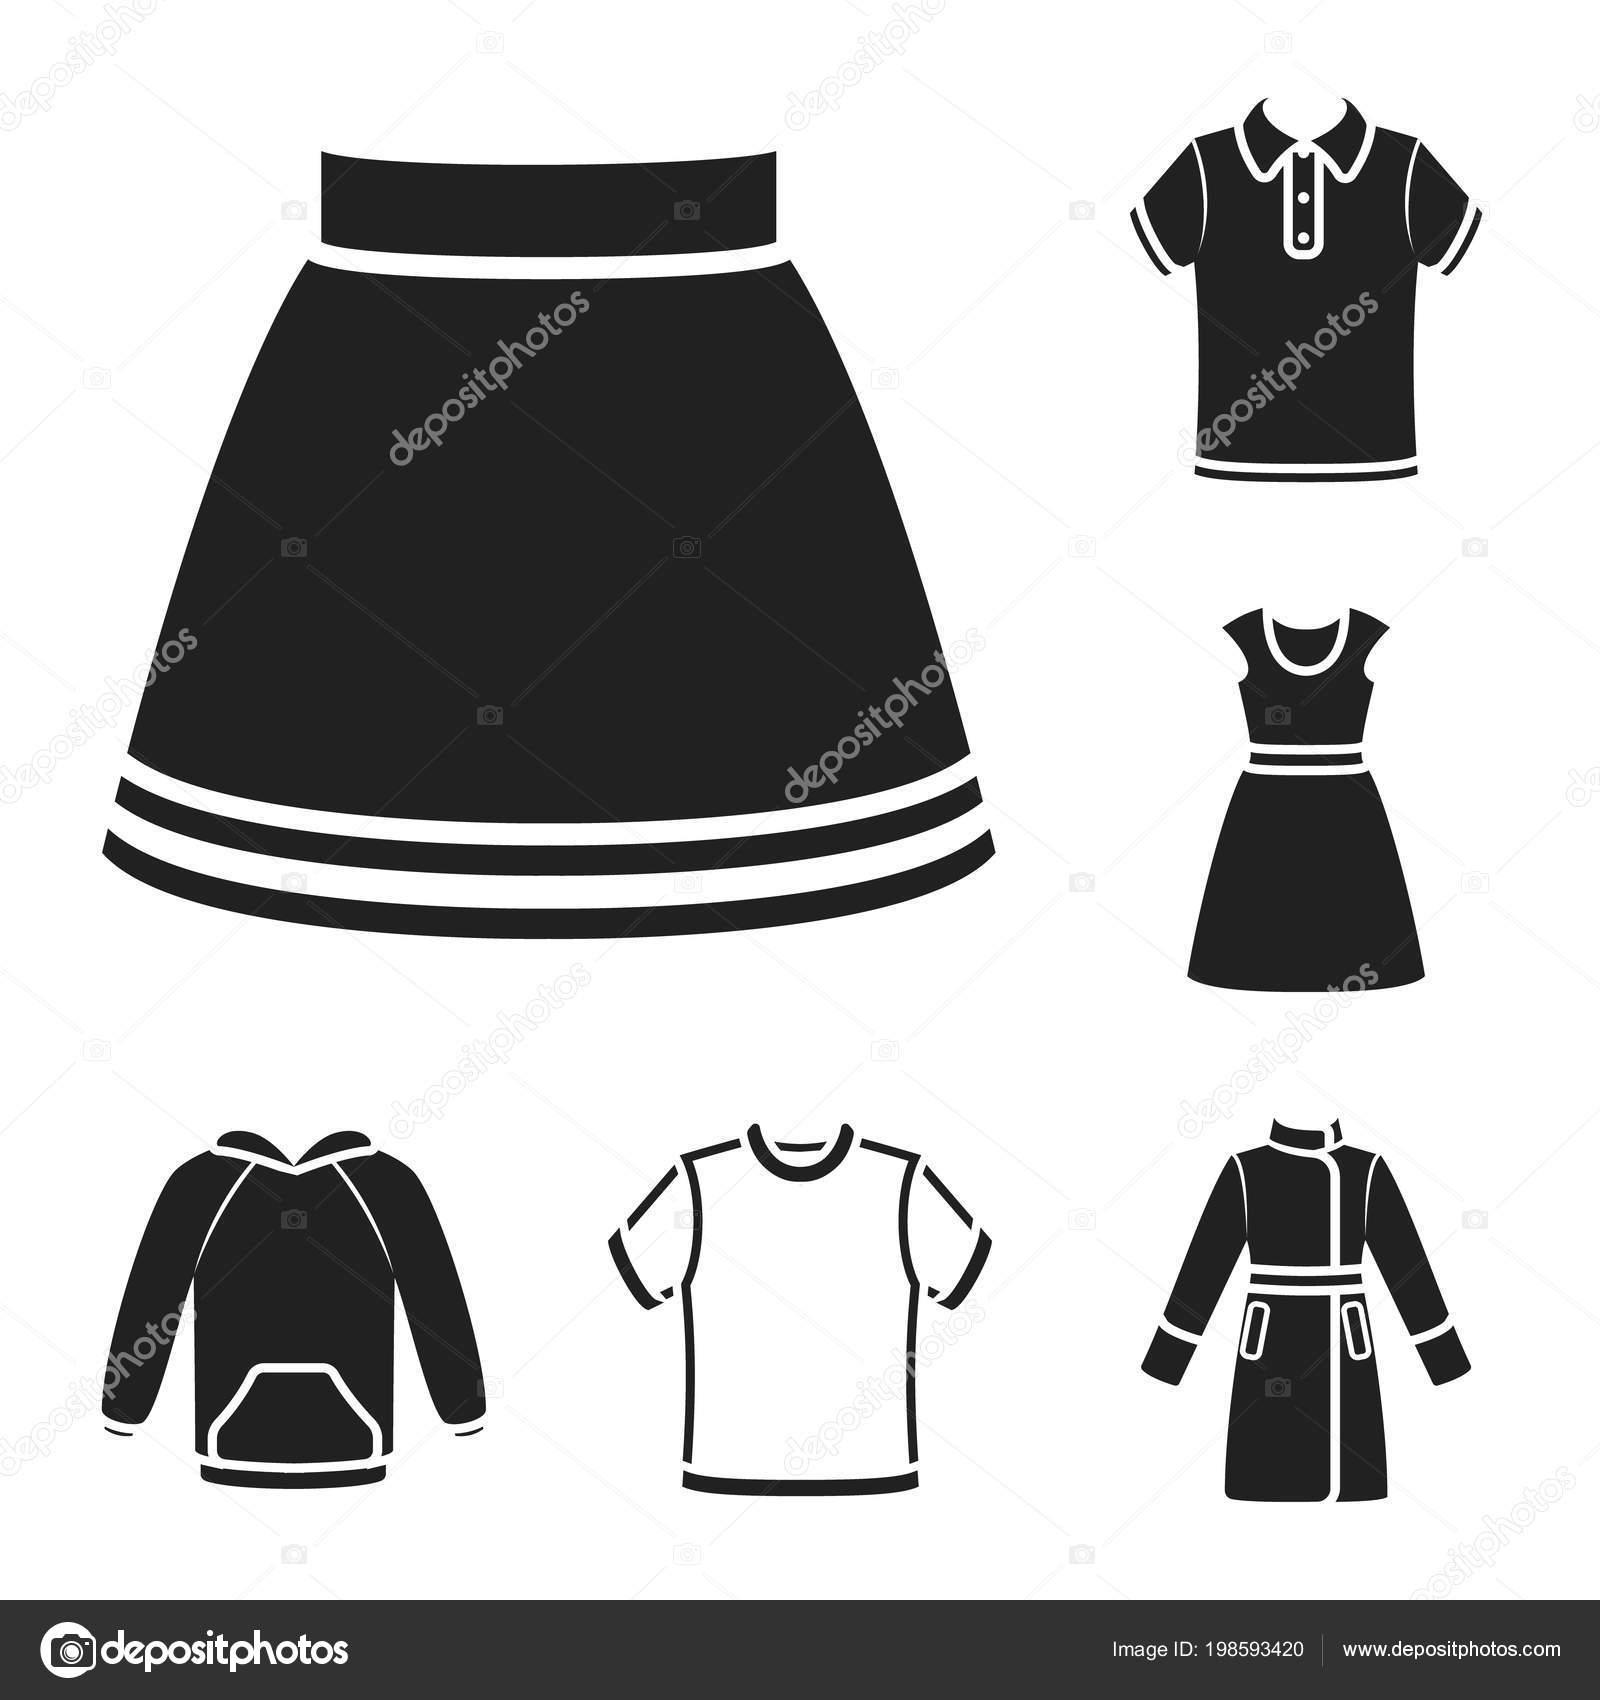 Spiksplinternieuw Verschillende soorten kleding zwarte pictogrammen in set collectie GB-43